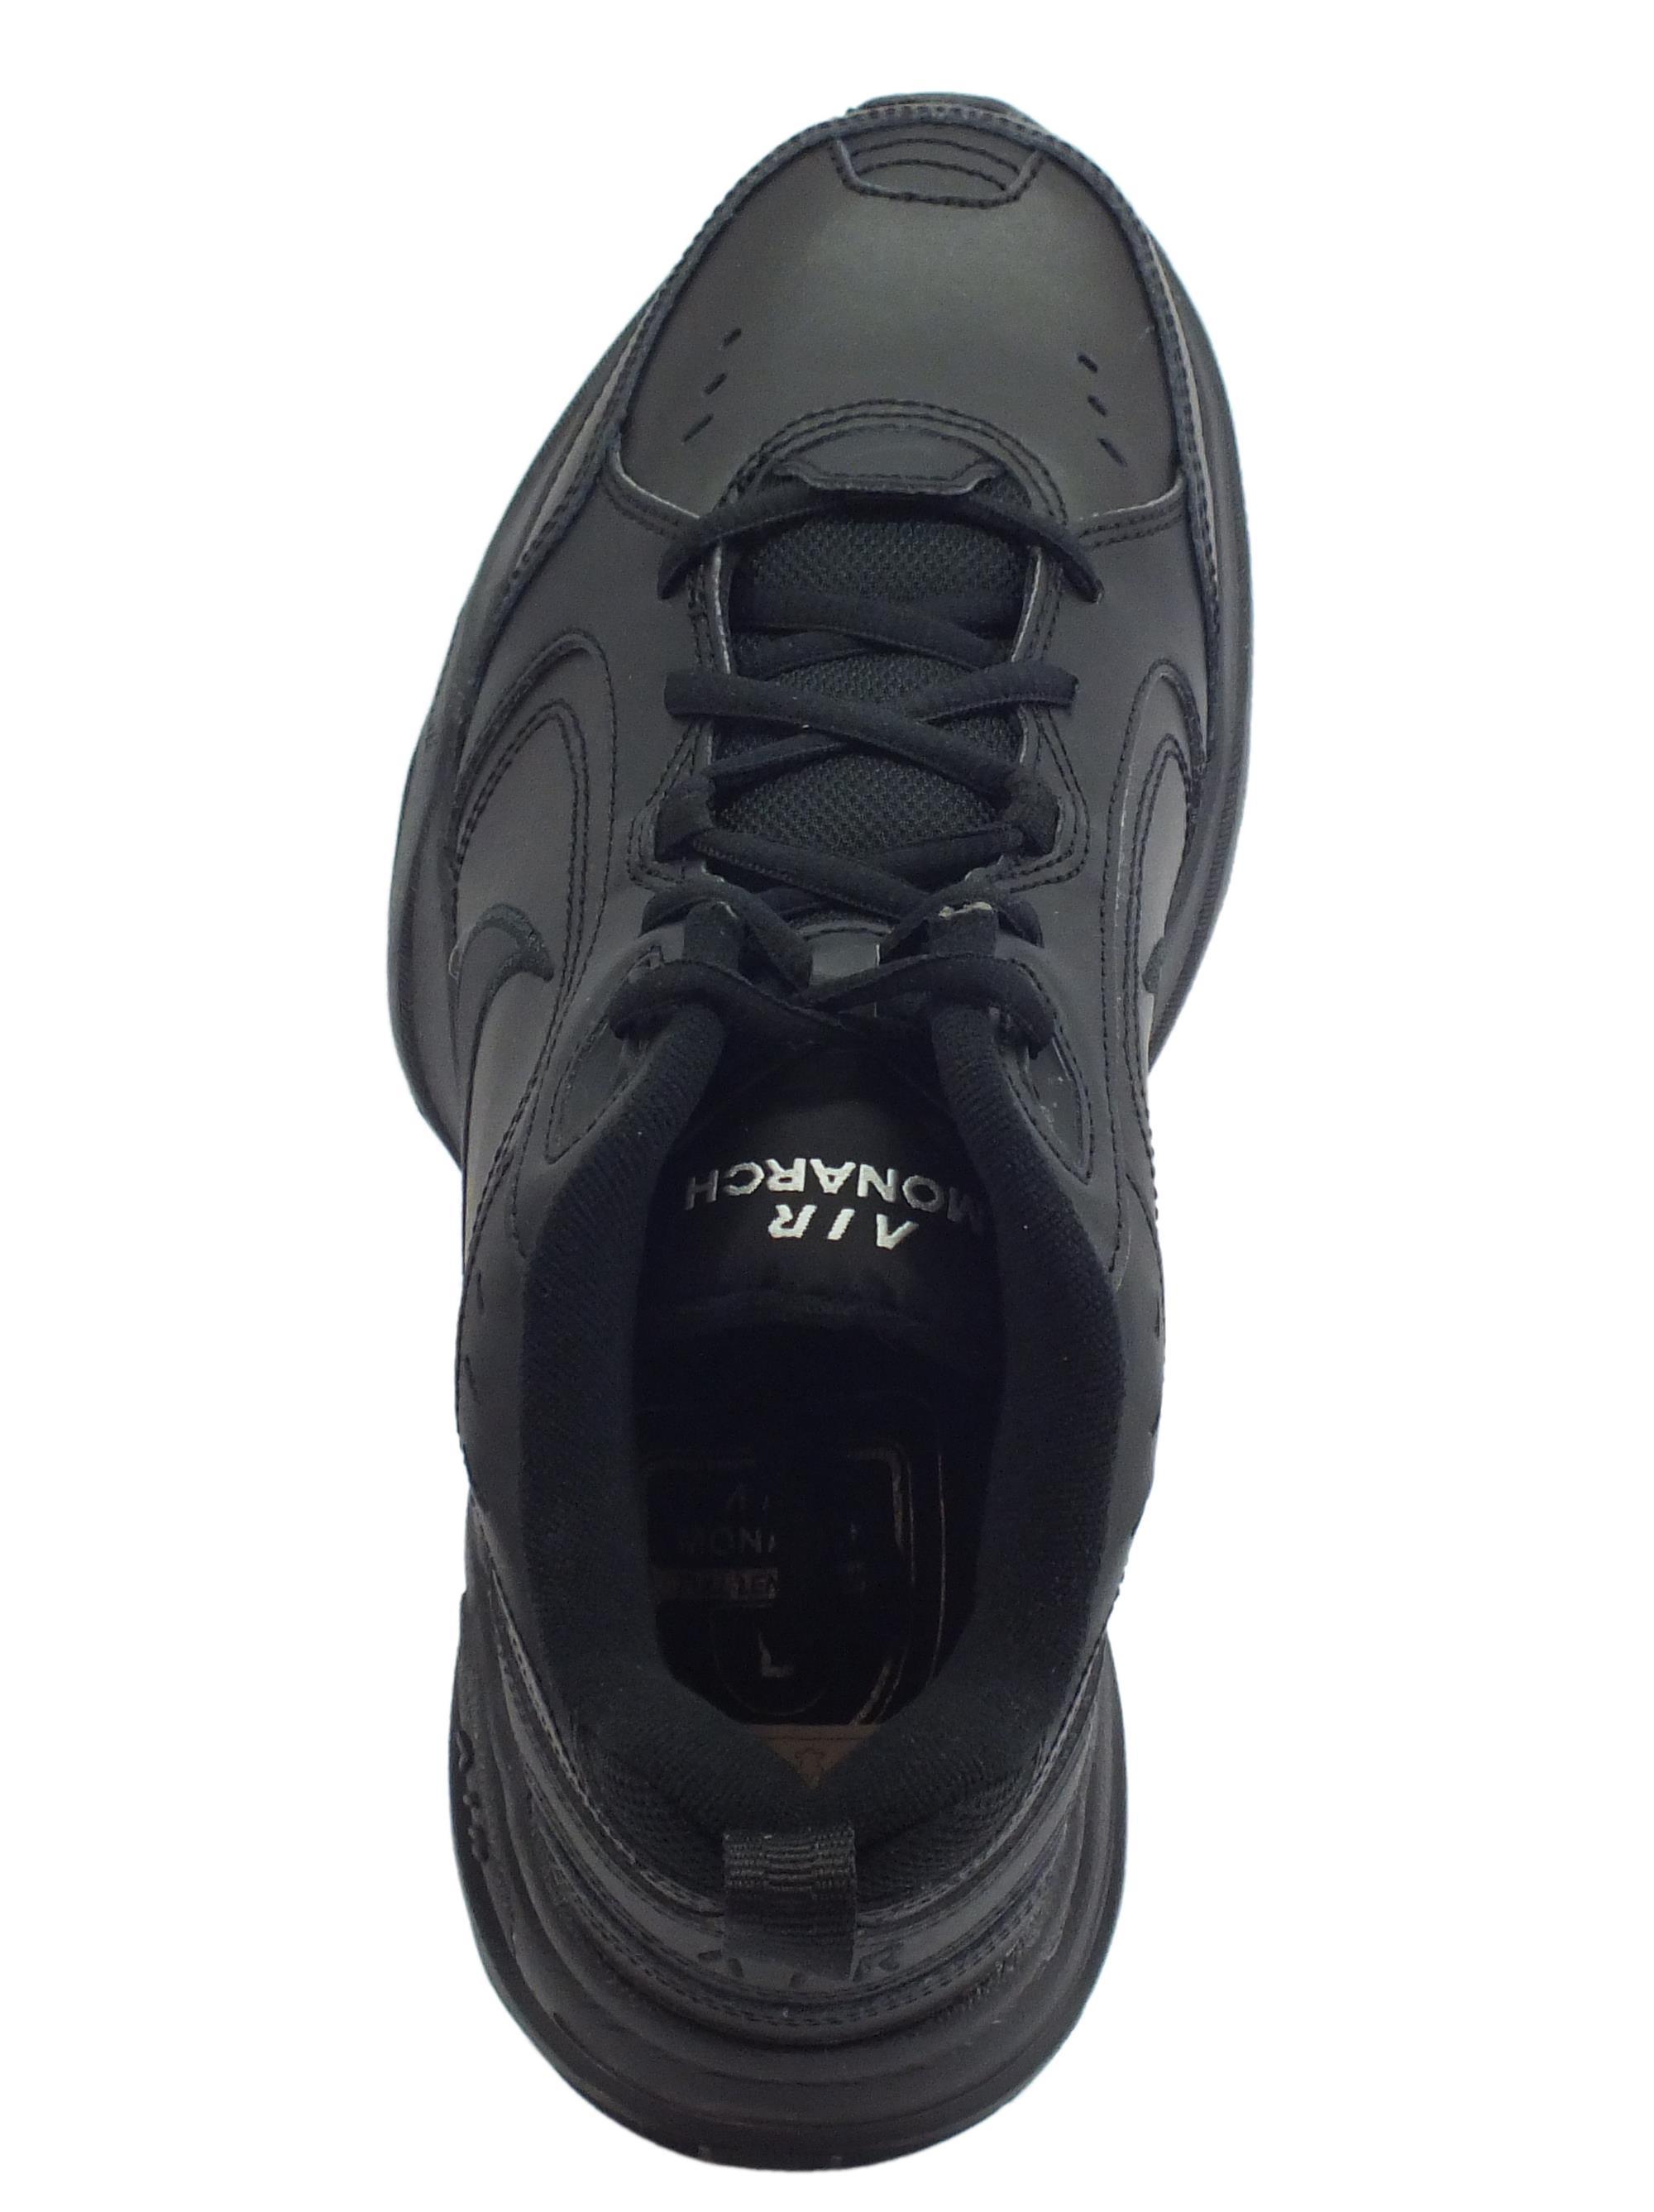 bb889b2c5ba7 Scarpe sportive Nike Air Monarch IV uomo pelle nera - Vitiello Calzature